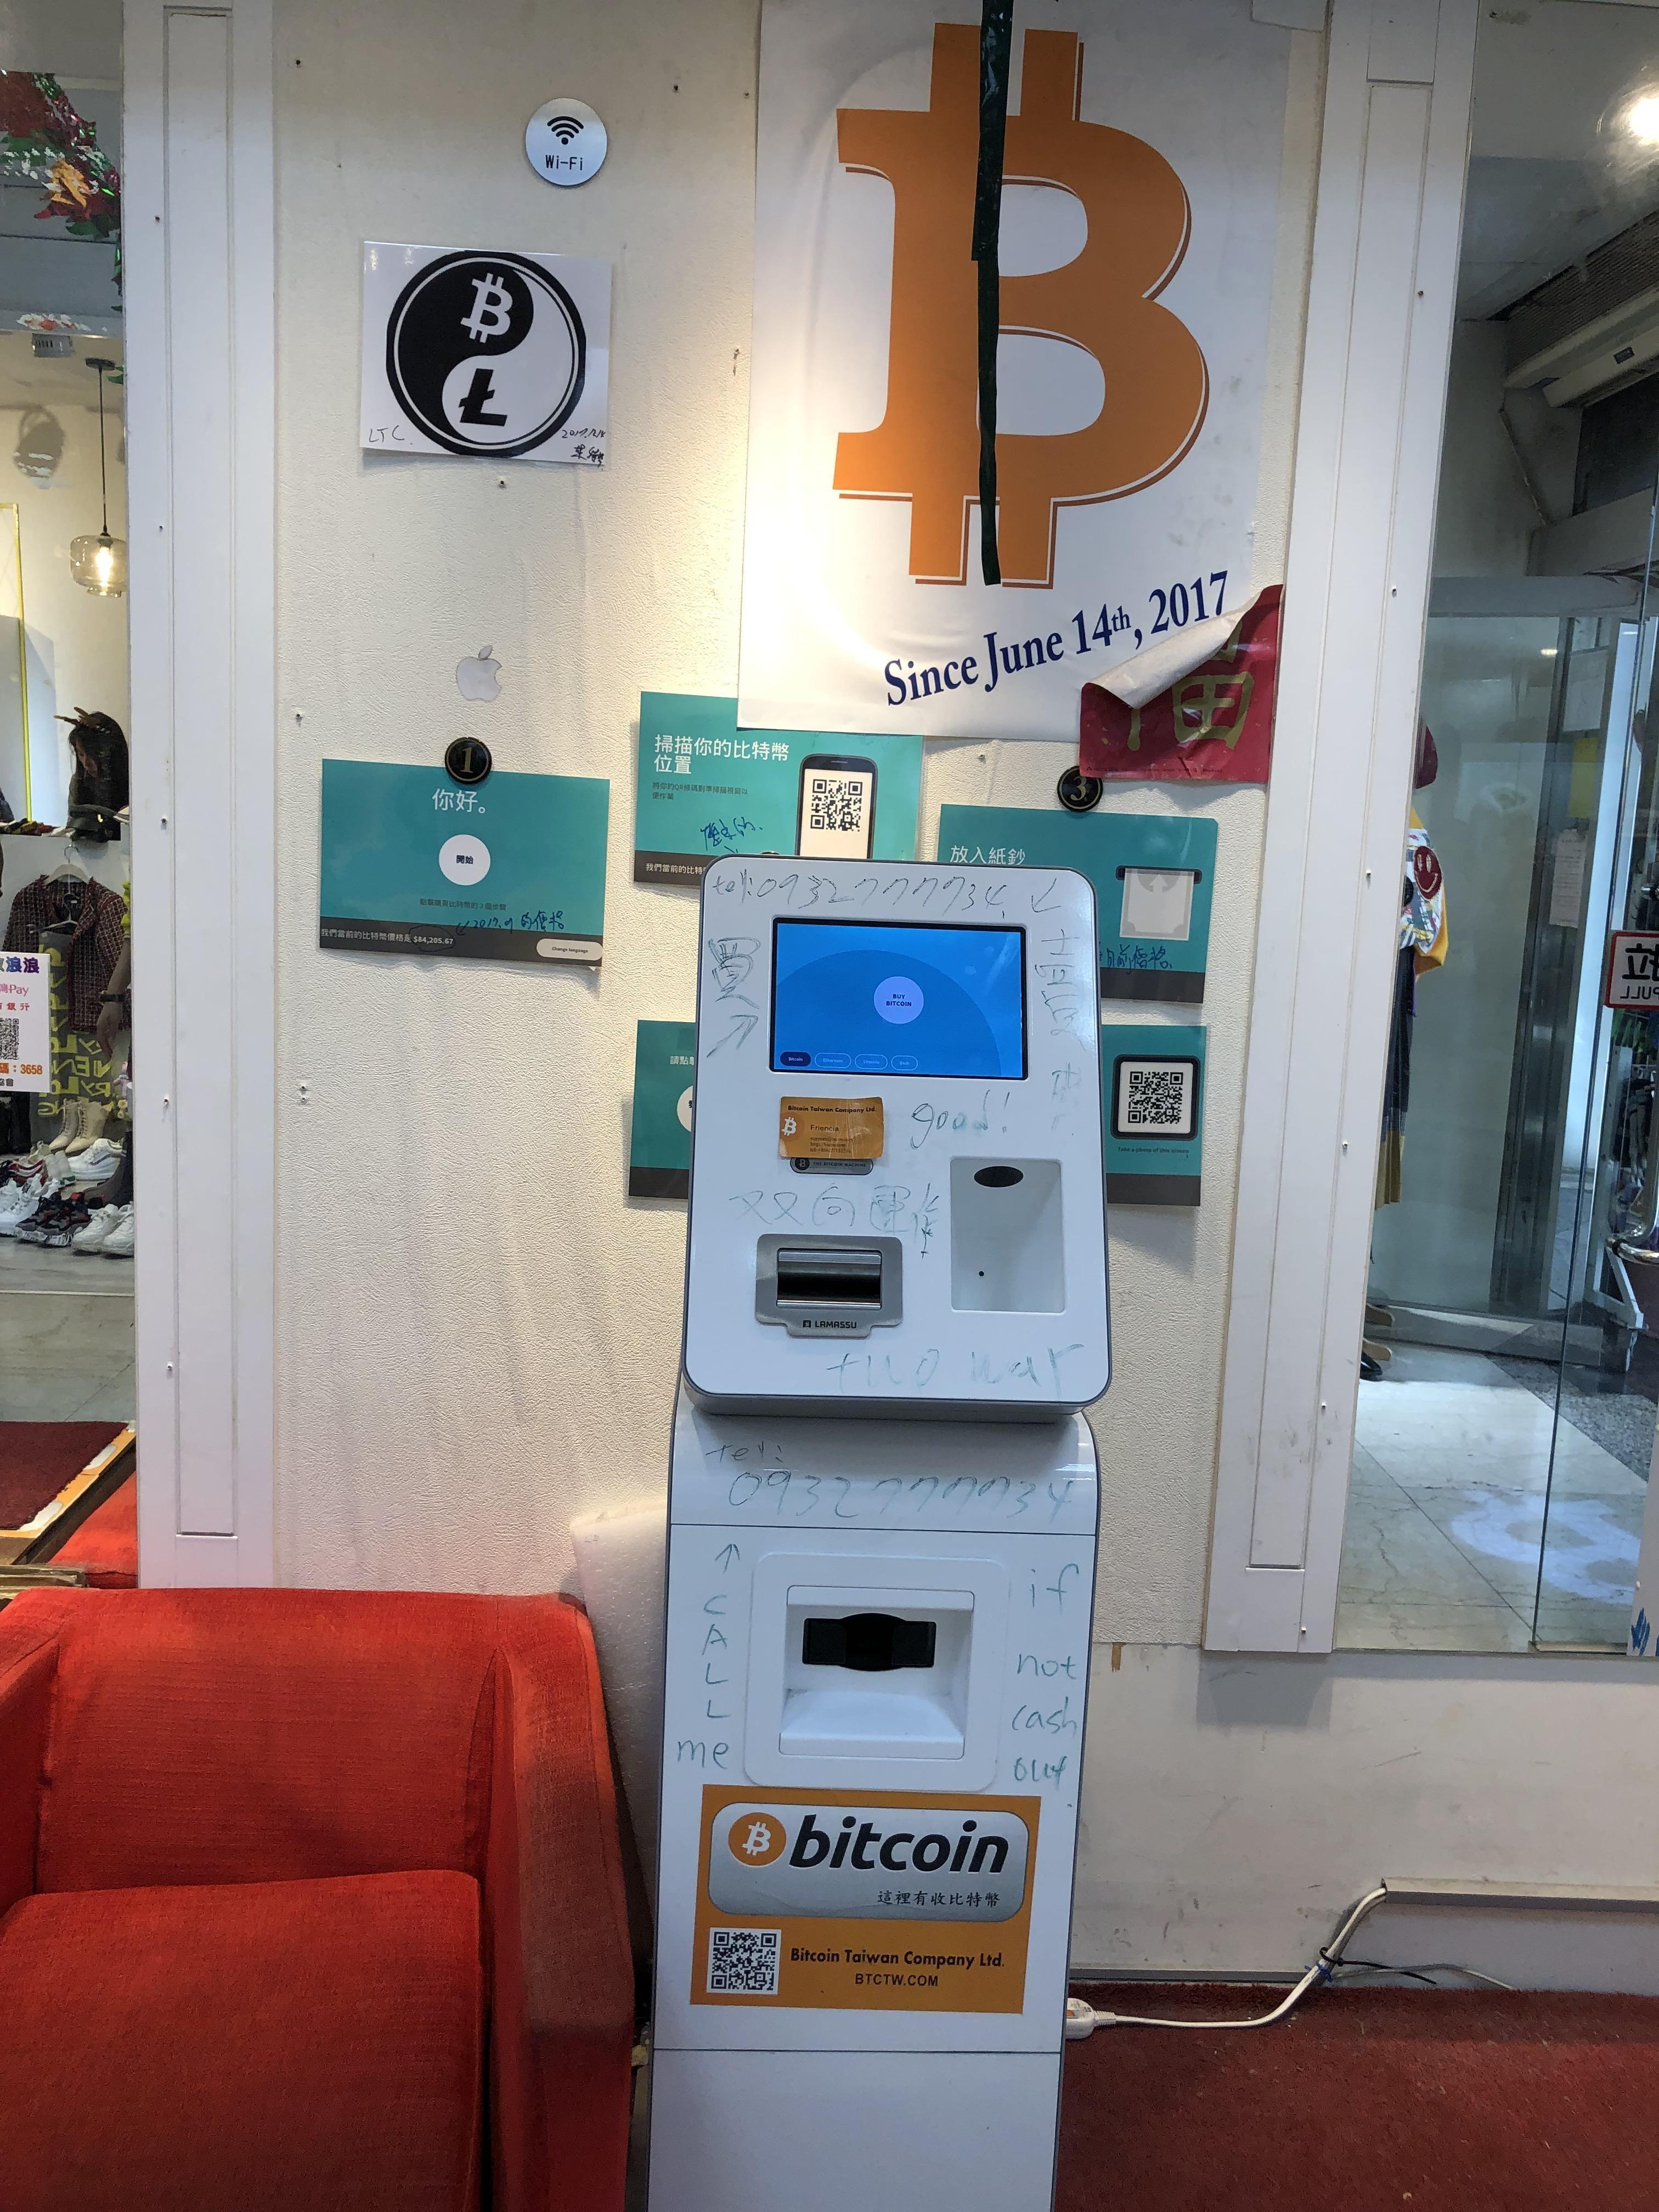 Bitcoin mixer reddit